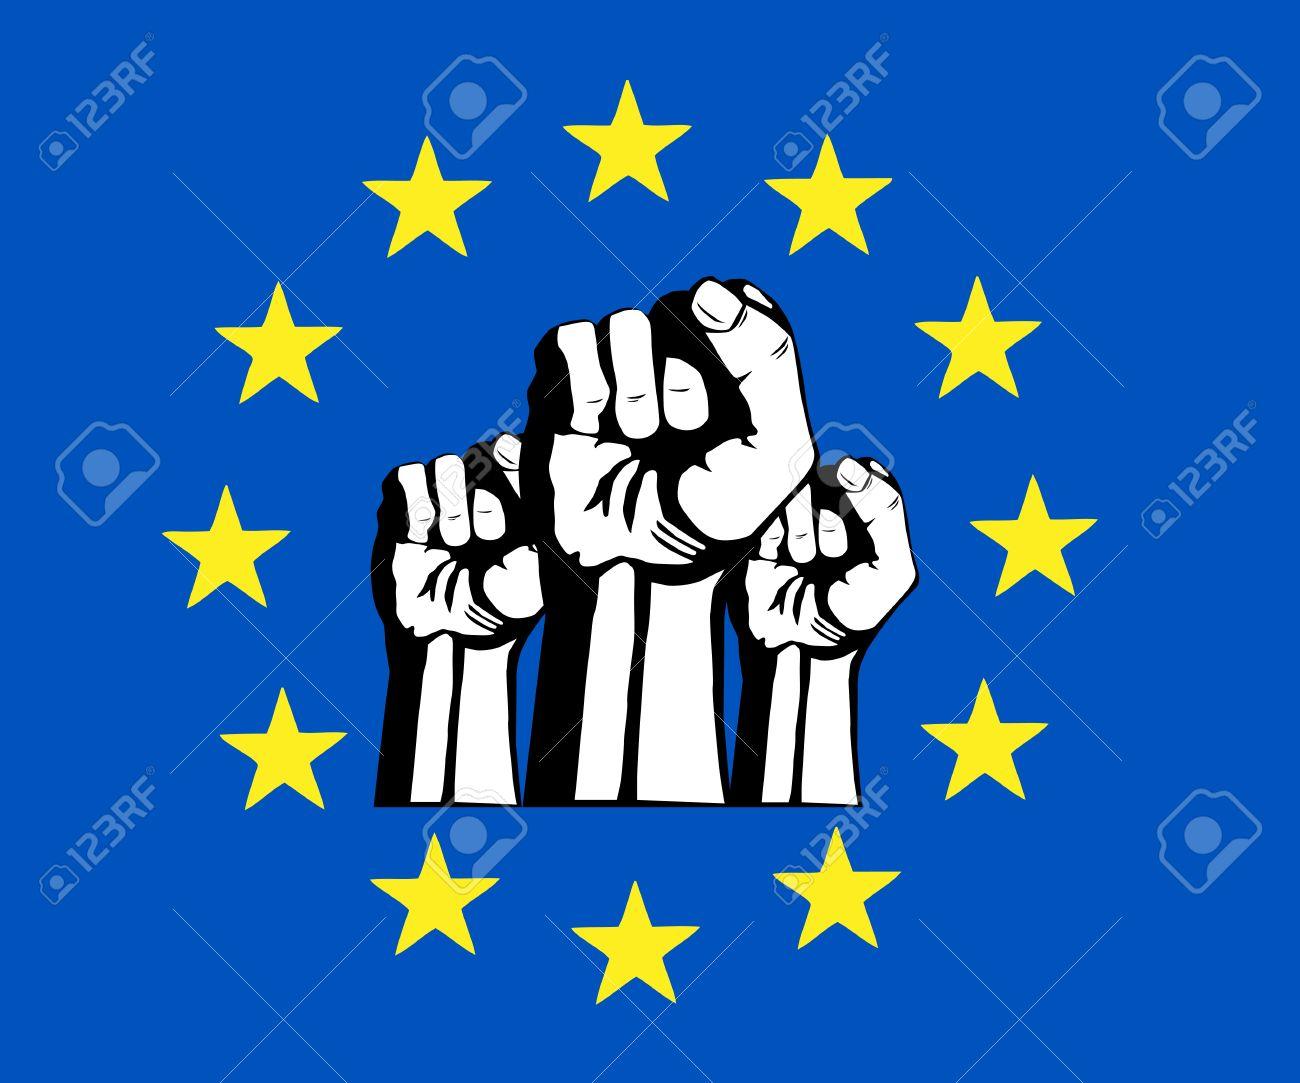 European Union Fist, Flag, Protest Royalty Free Cliparts, Vectors.